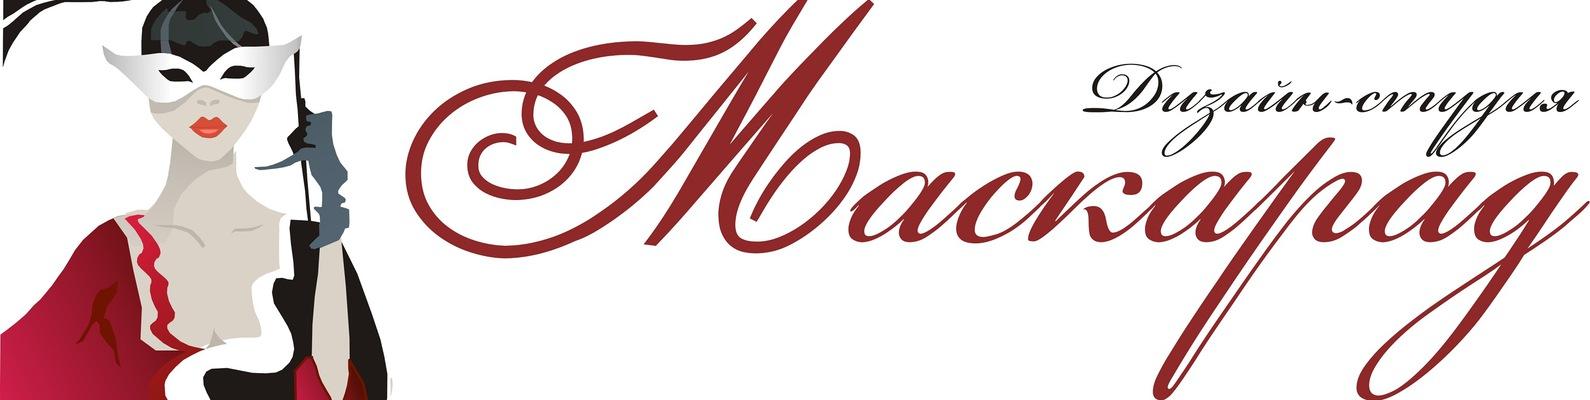 «Маскарад» - аренда карнавальных костюмов | VK - photo#35